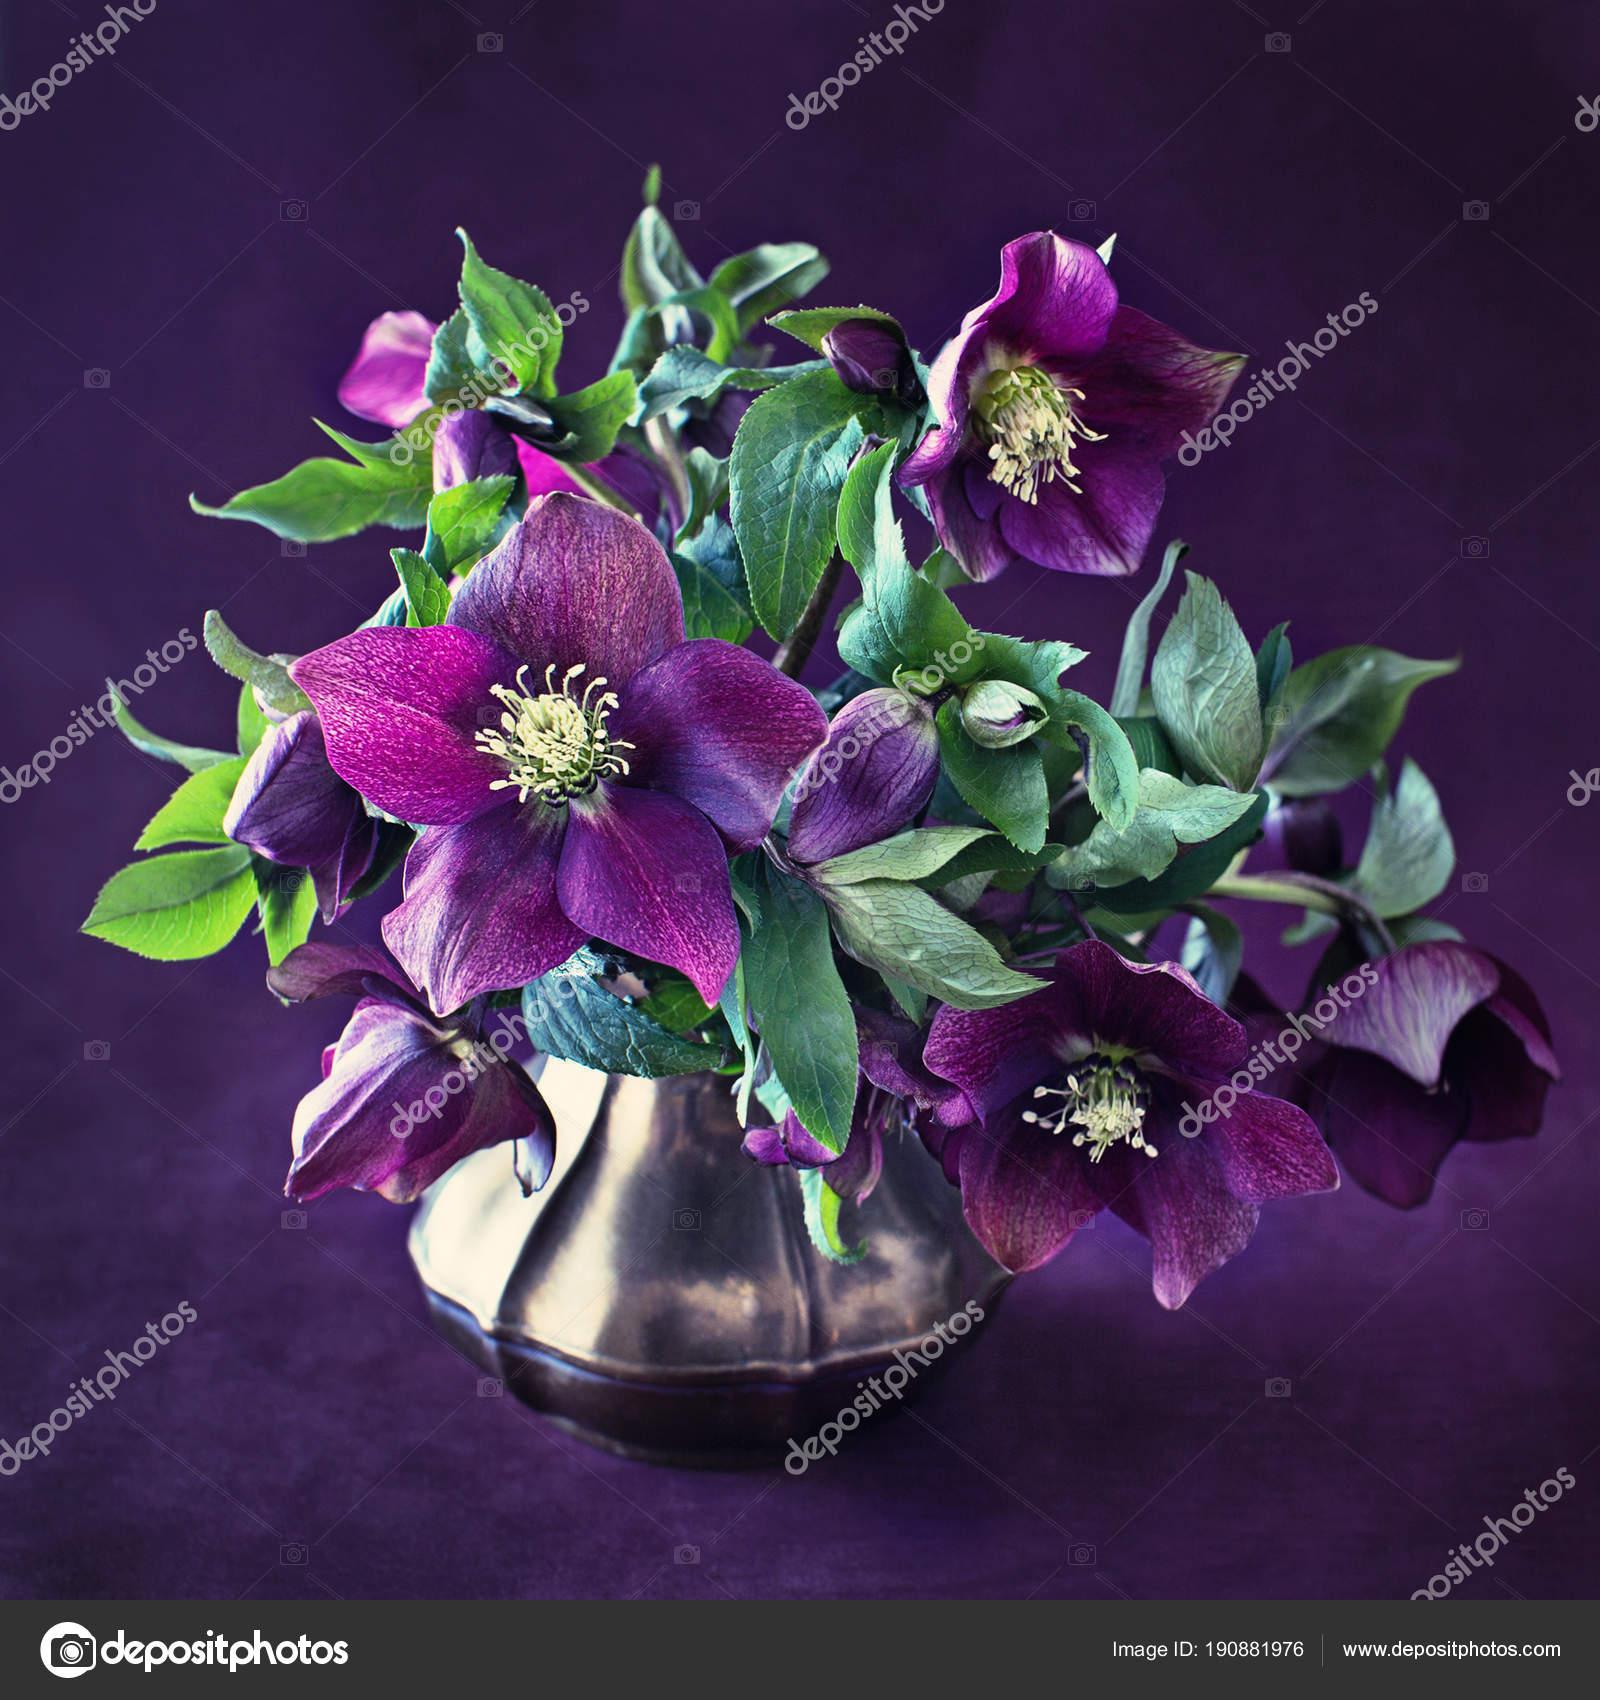 Beautiful Bouquet Purple Flowers Dark Background Vintage Style Grunge Paper Stock Photo C Ulchik74 190881976